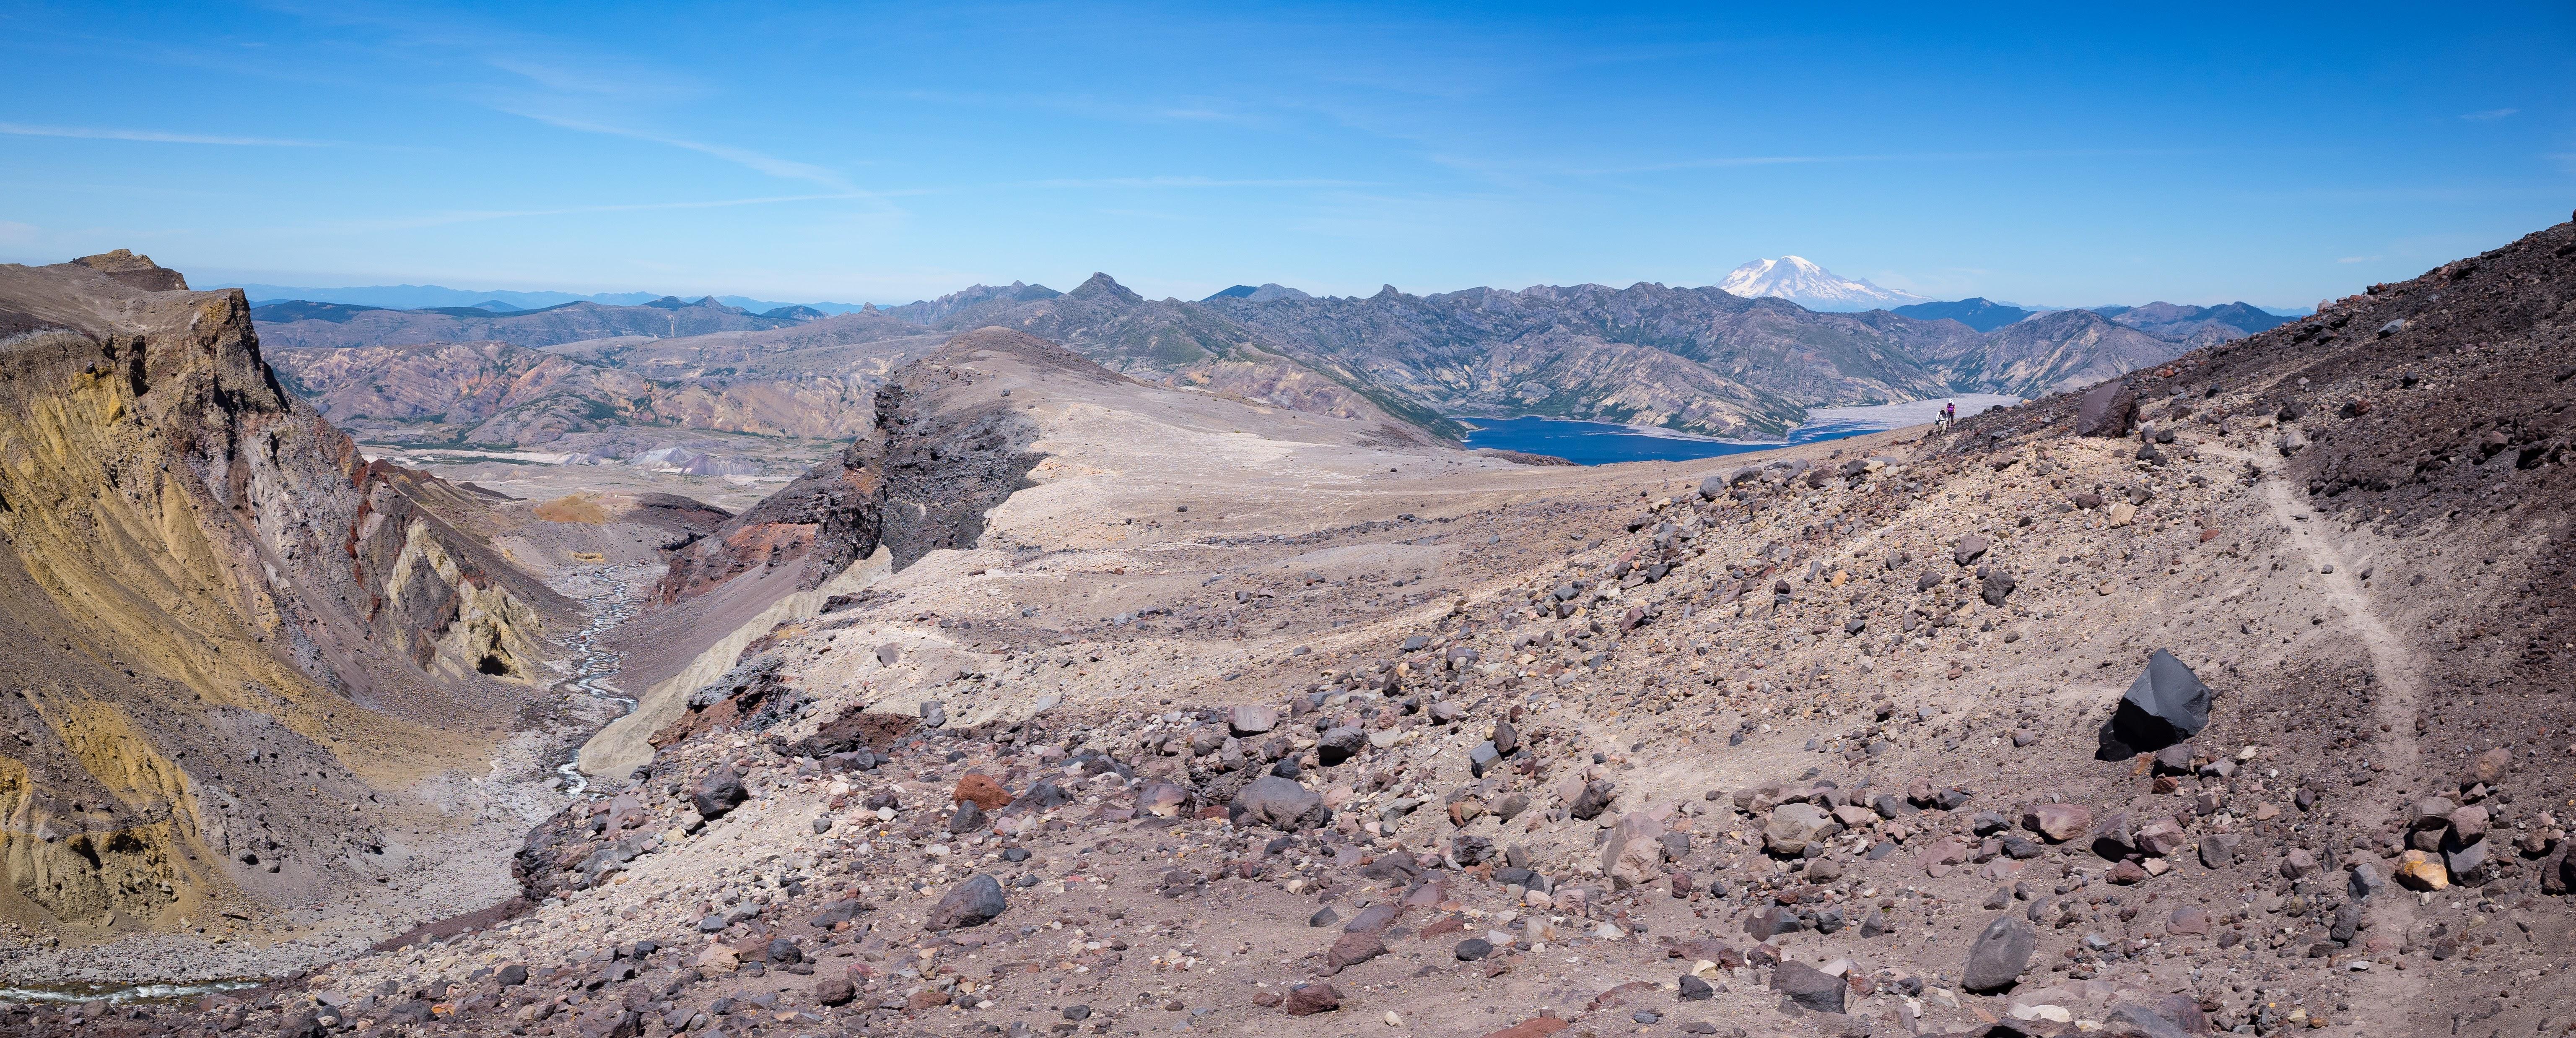 Mount Saint Helens, WA